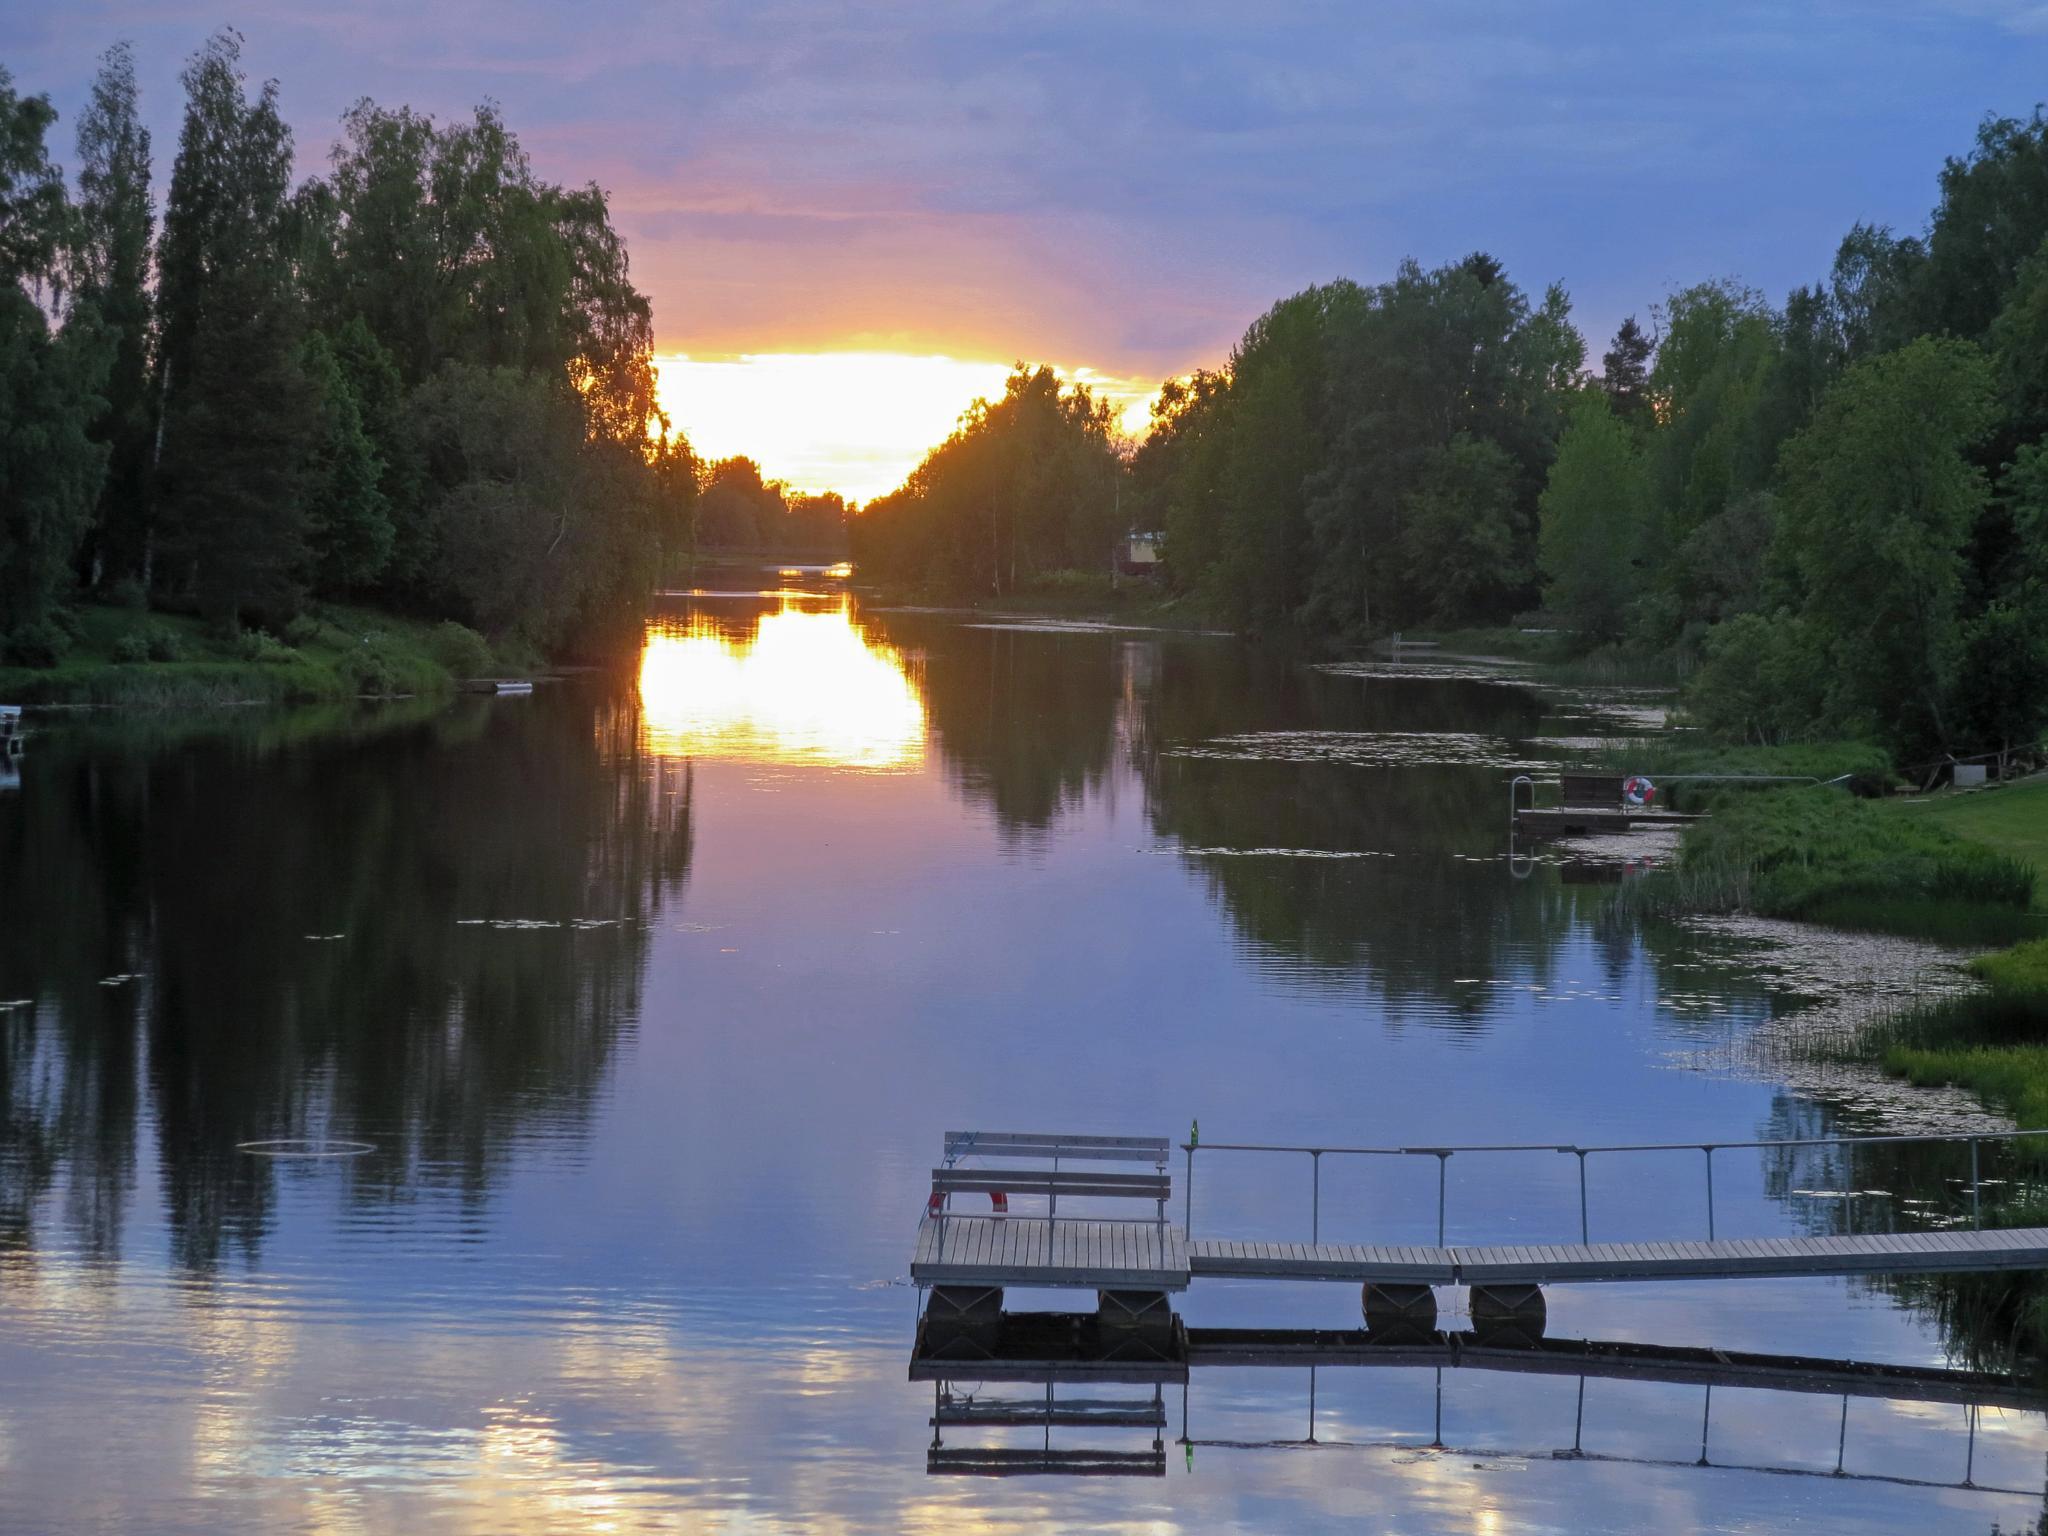 Midsummer lights on Finnish riverside by evasojahannele